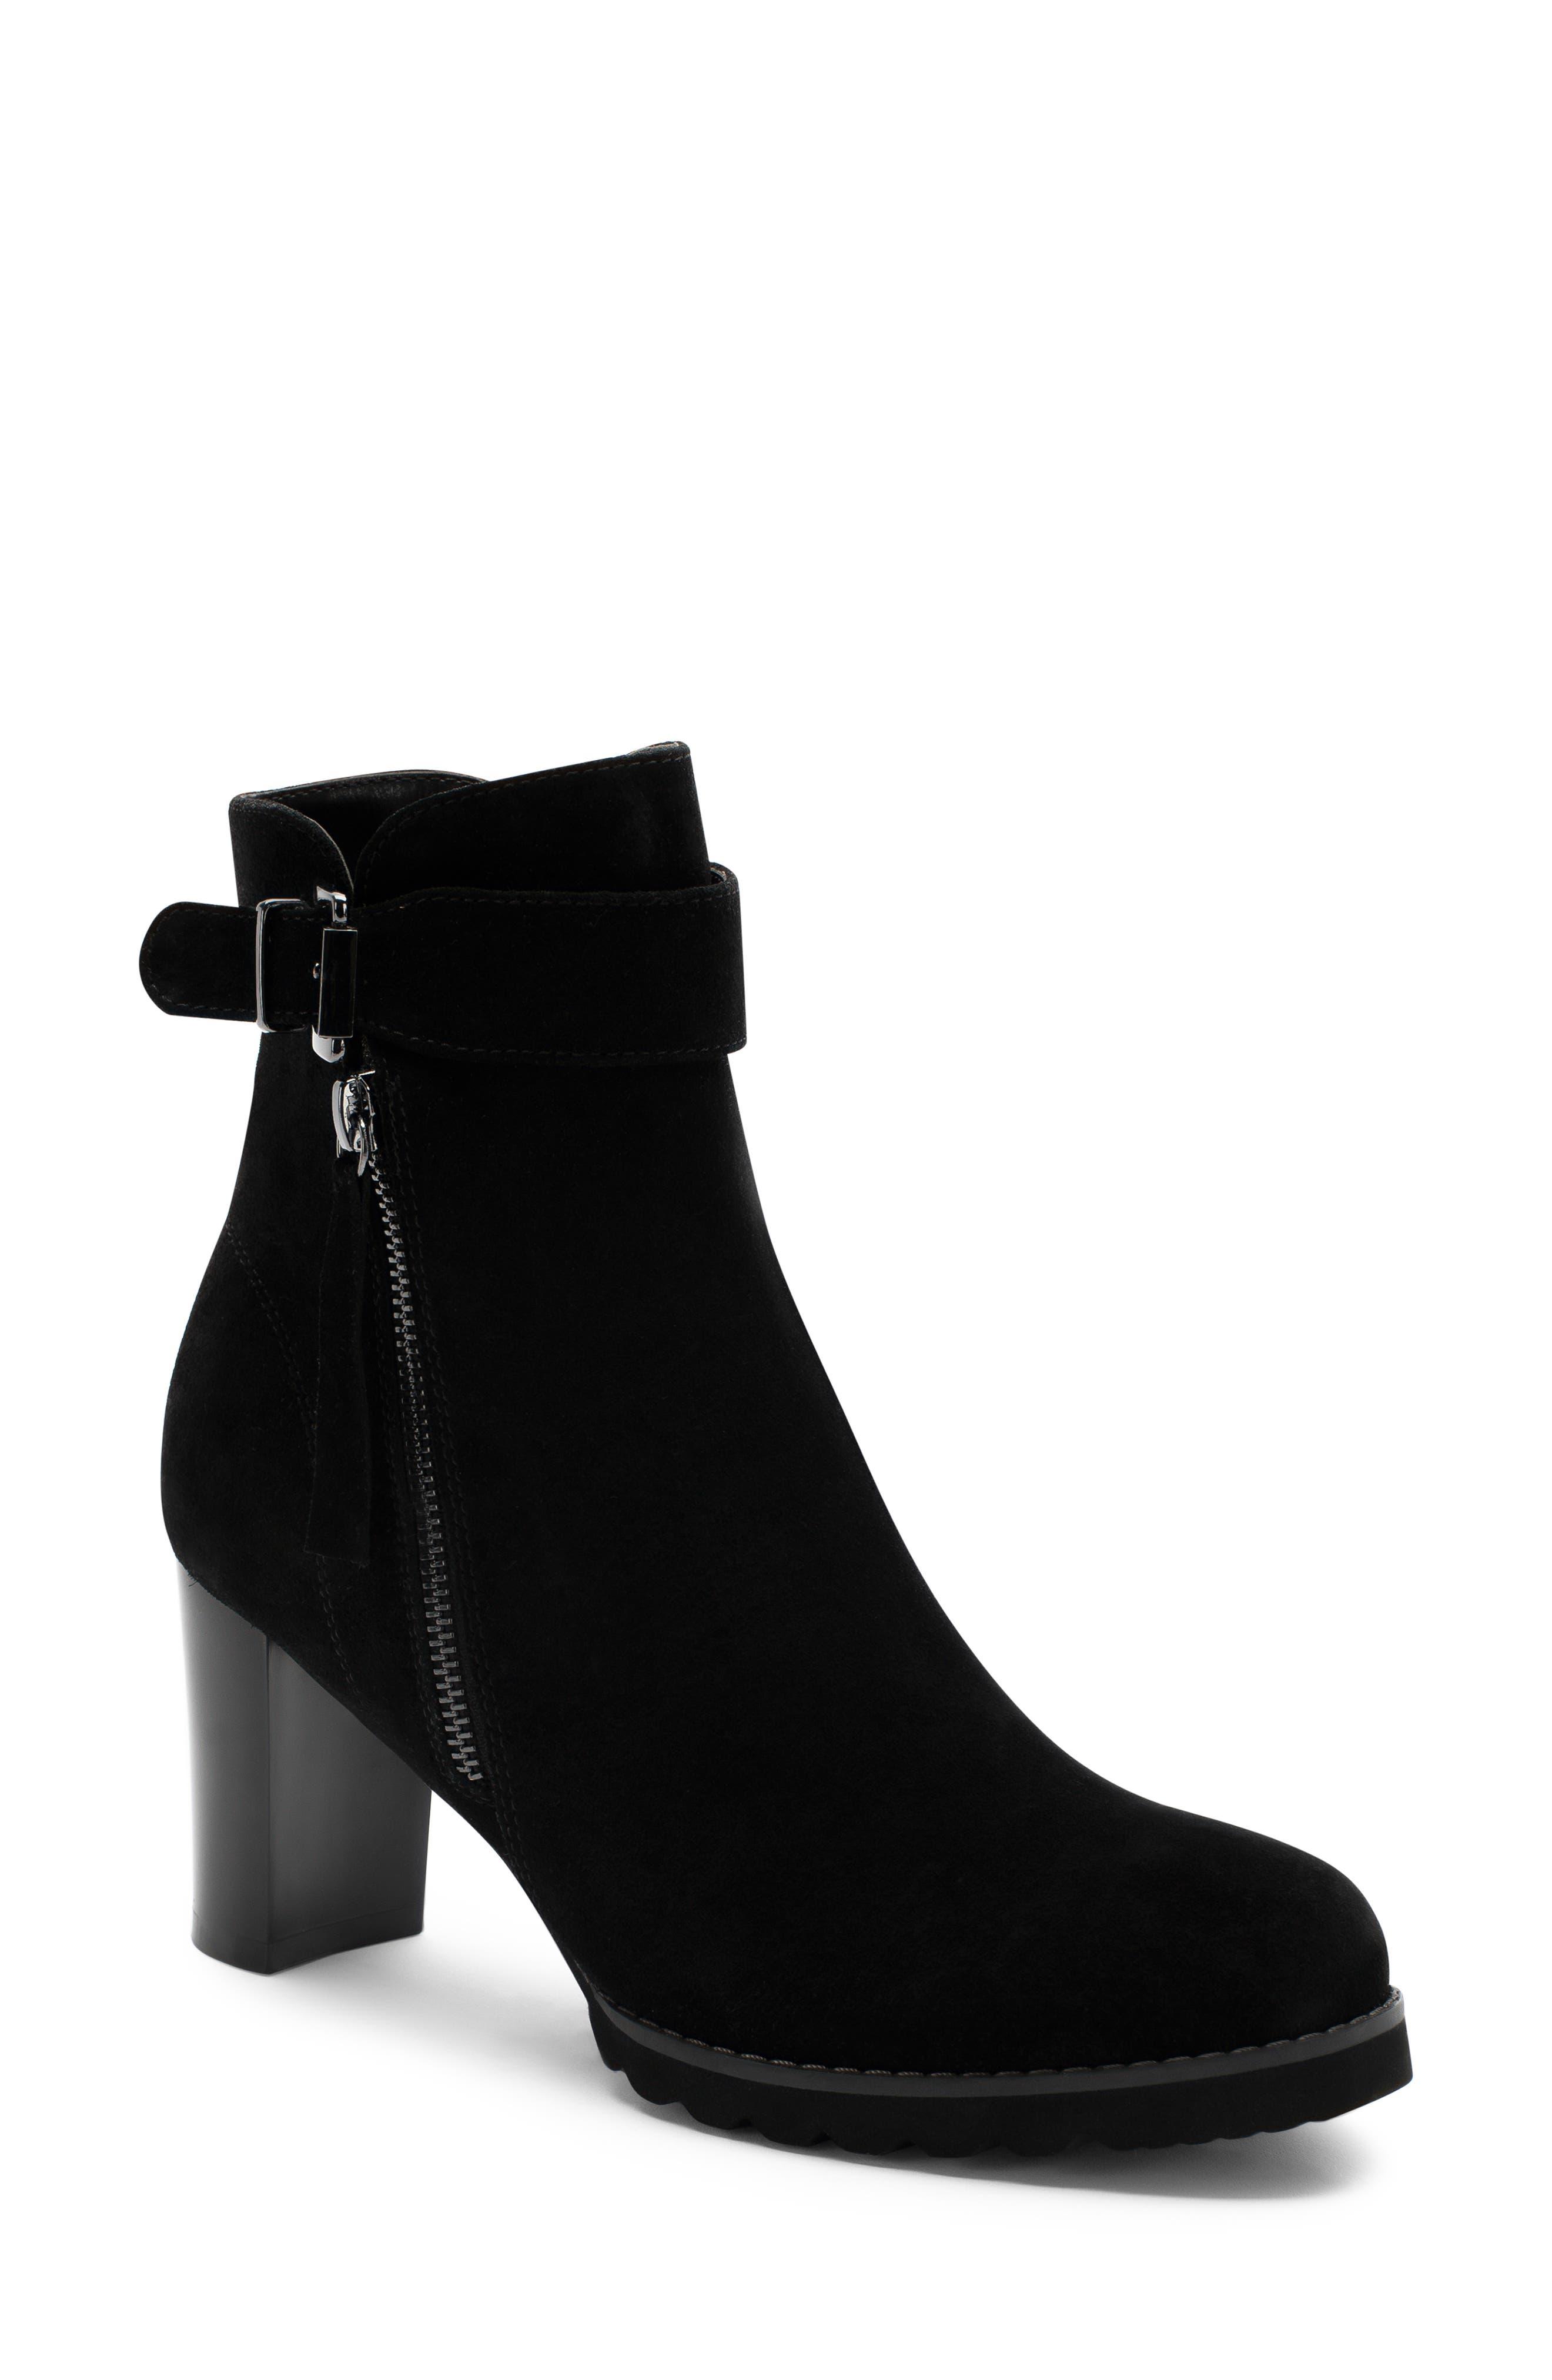 Blondo Anic Waterproof Ankle Boot- Black